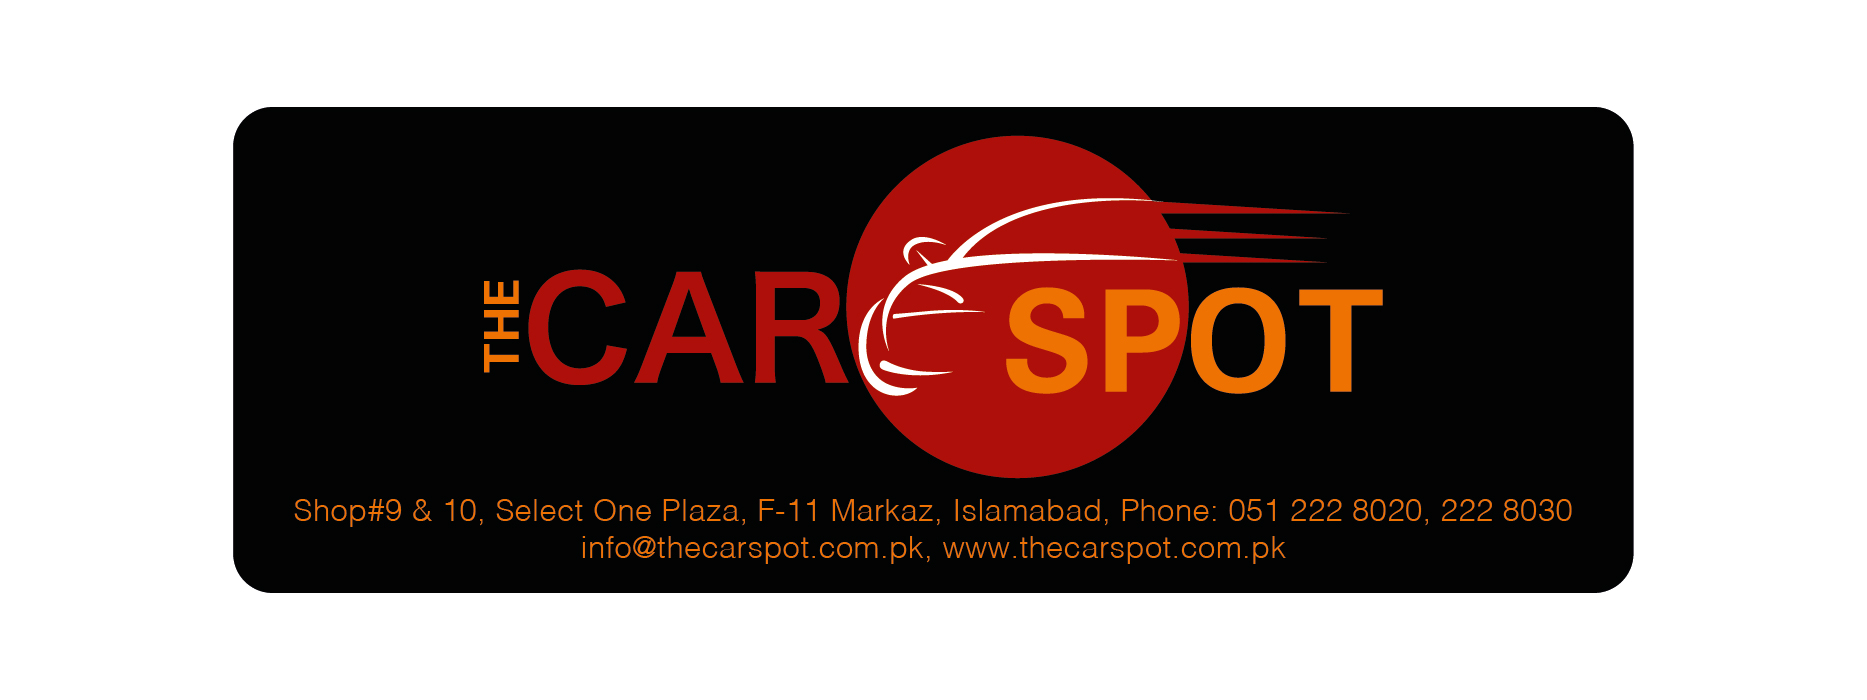 The Car Spot